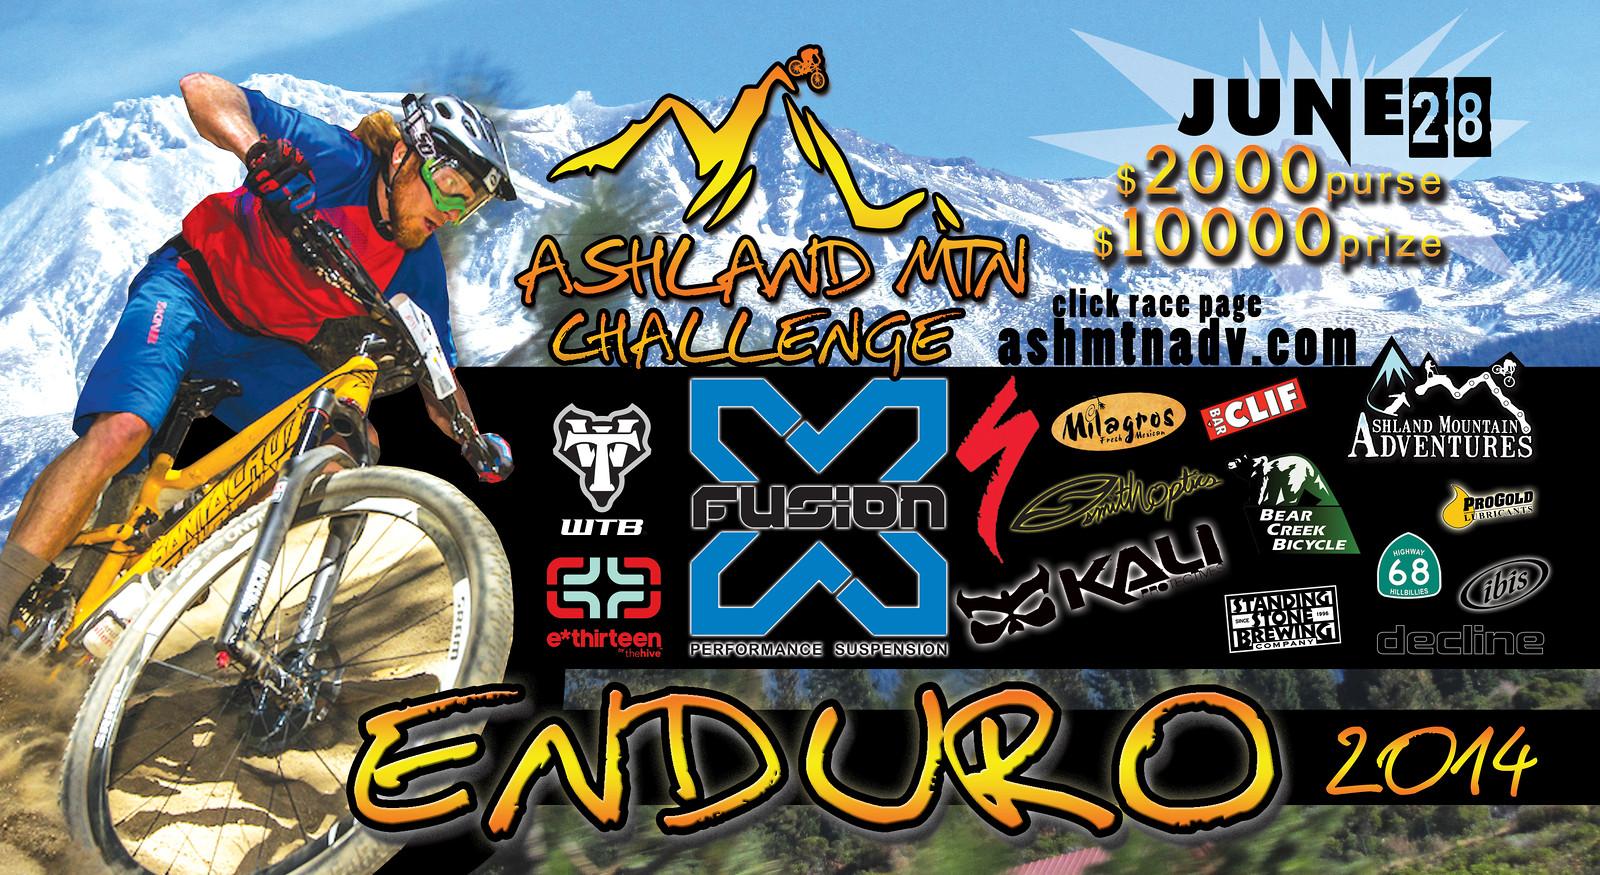 ashland amc 2014 - bikesales - Mountain Biking Pictures - Vital MTB